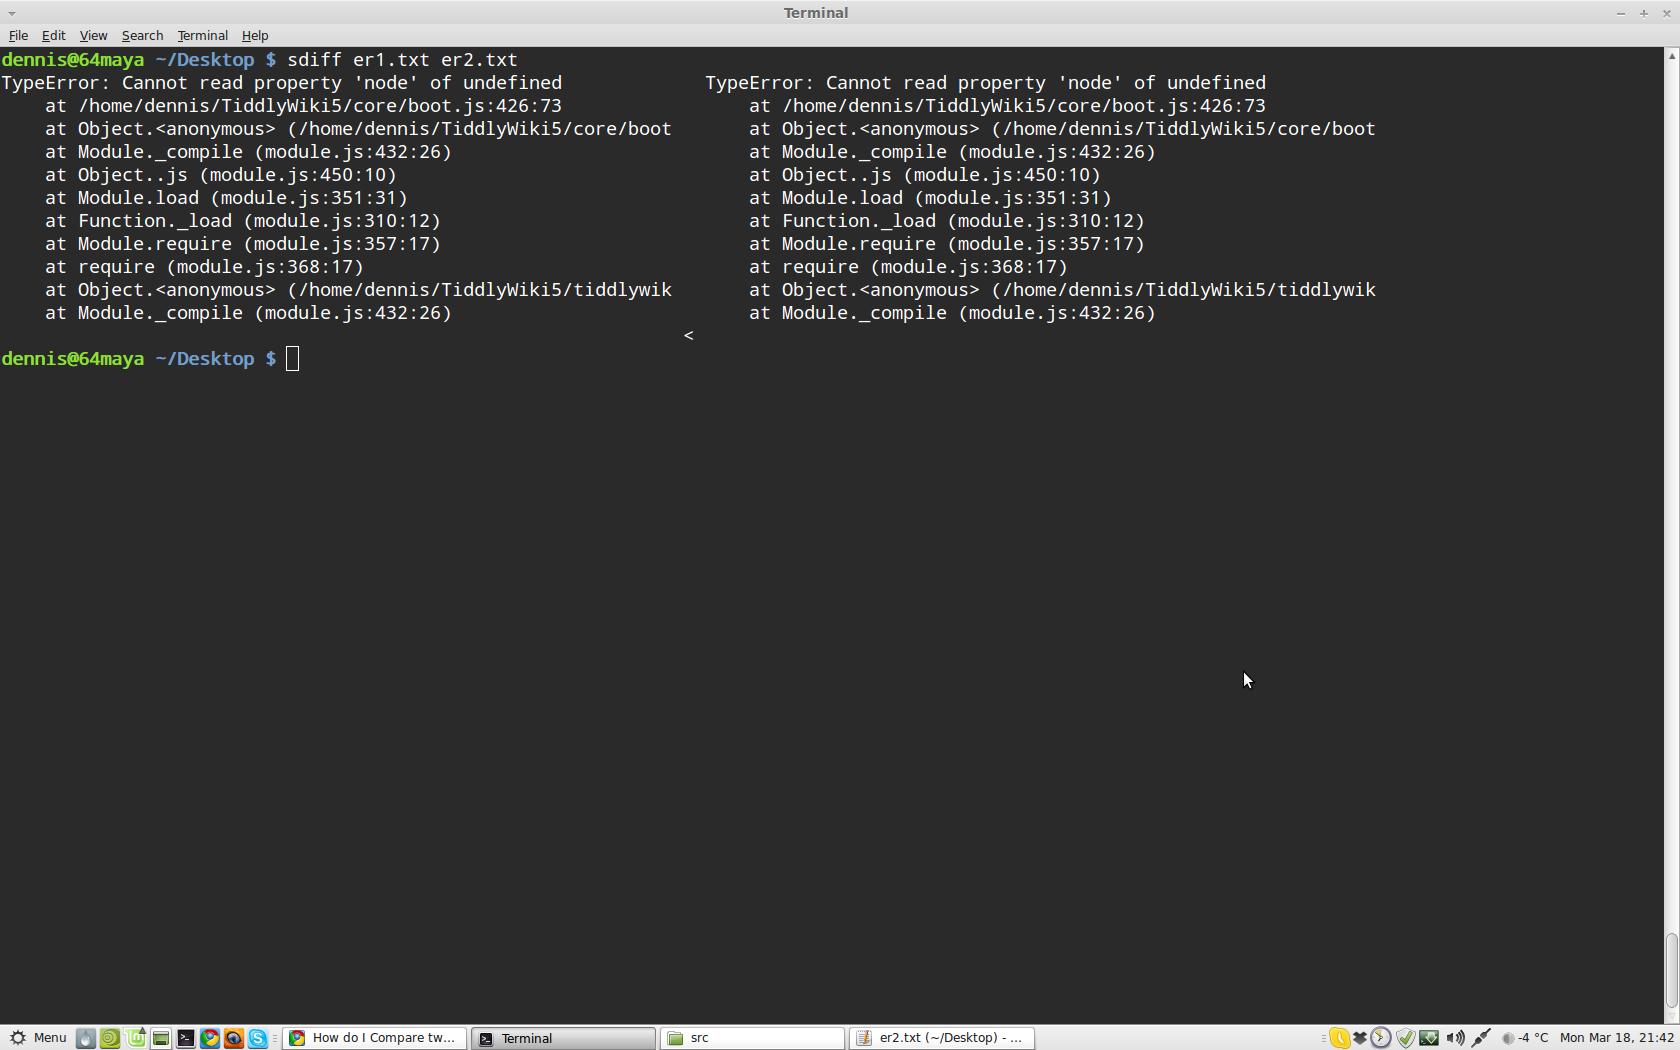 sdiff_Screenshot-1